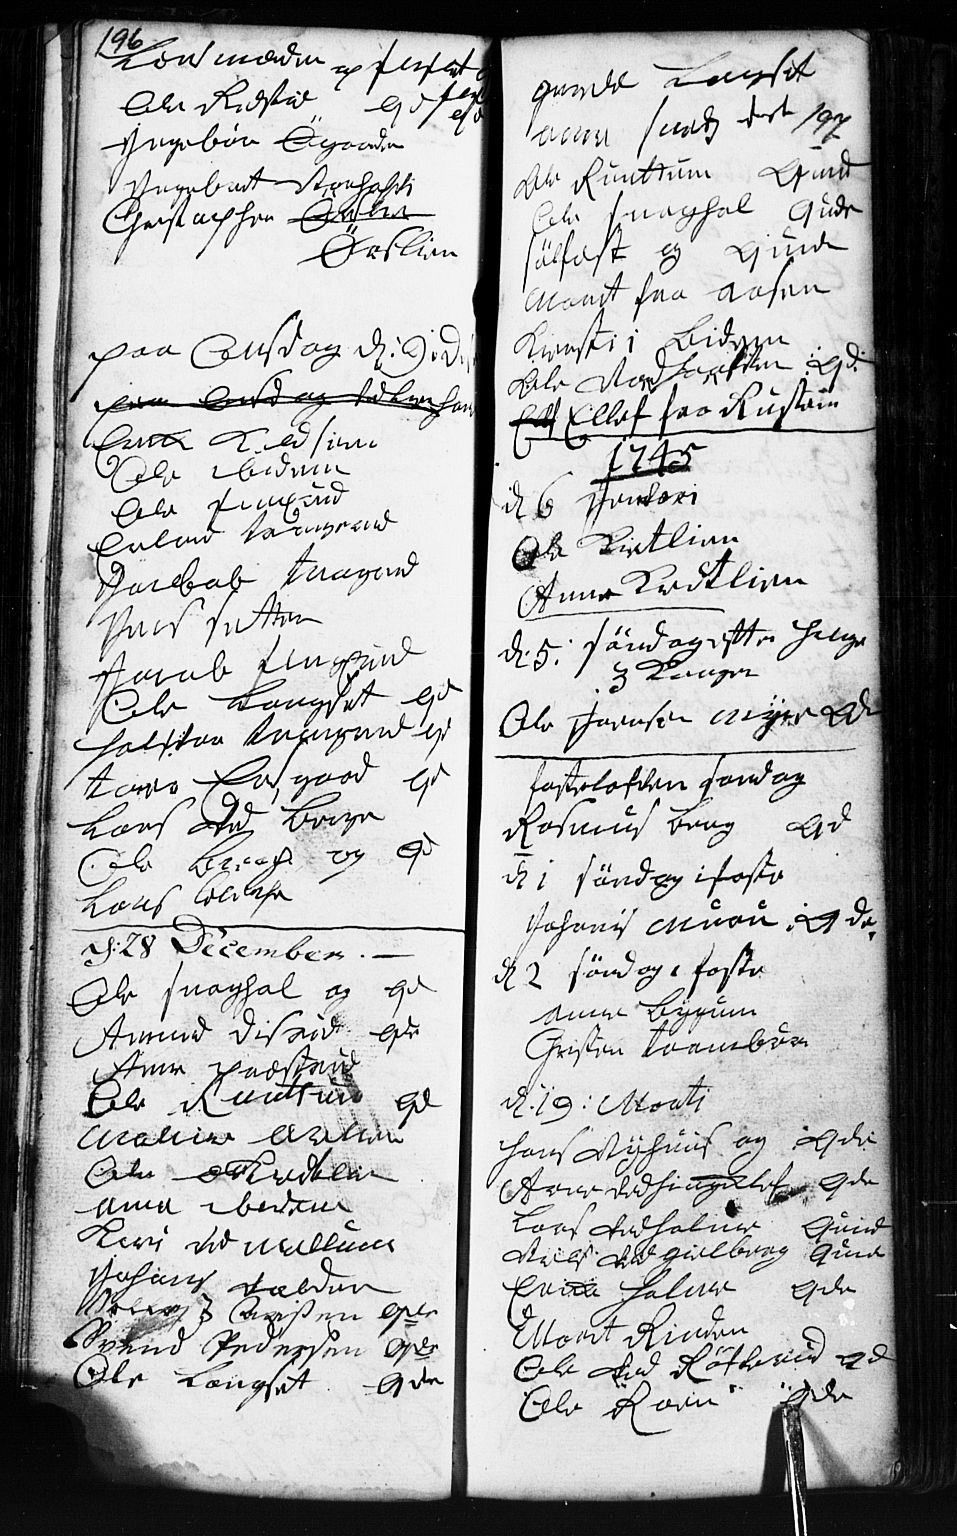 SAH, Fåberg prestekontor, Klokkerbok nr. 2, 1741-1756, s. 196-197